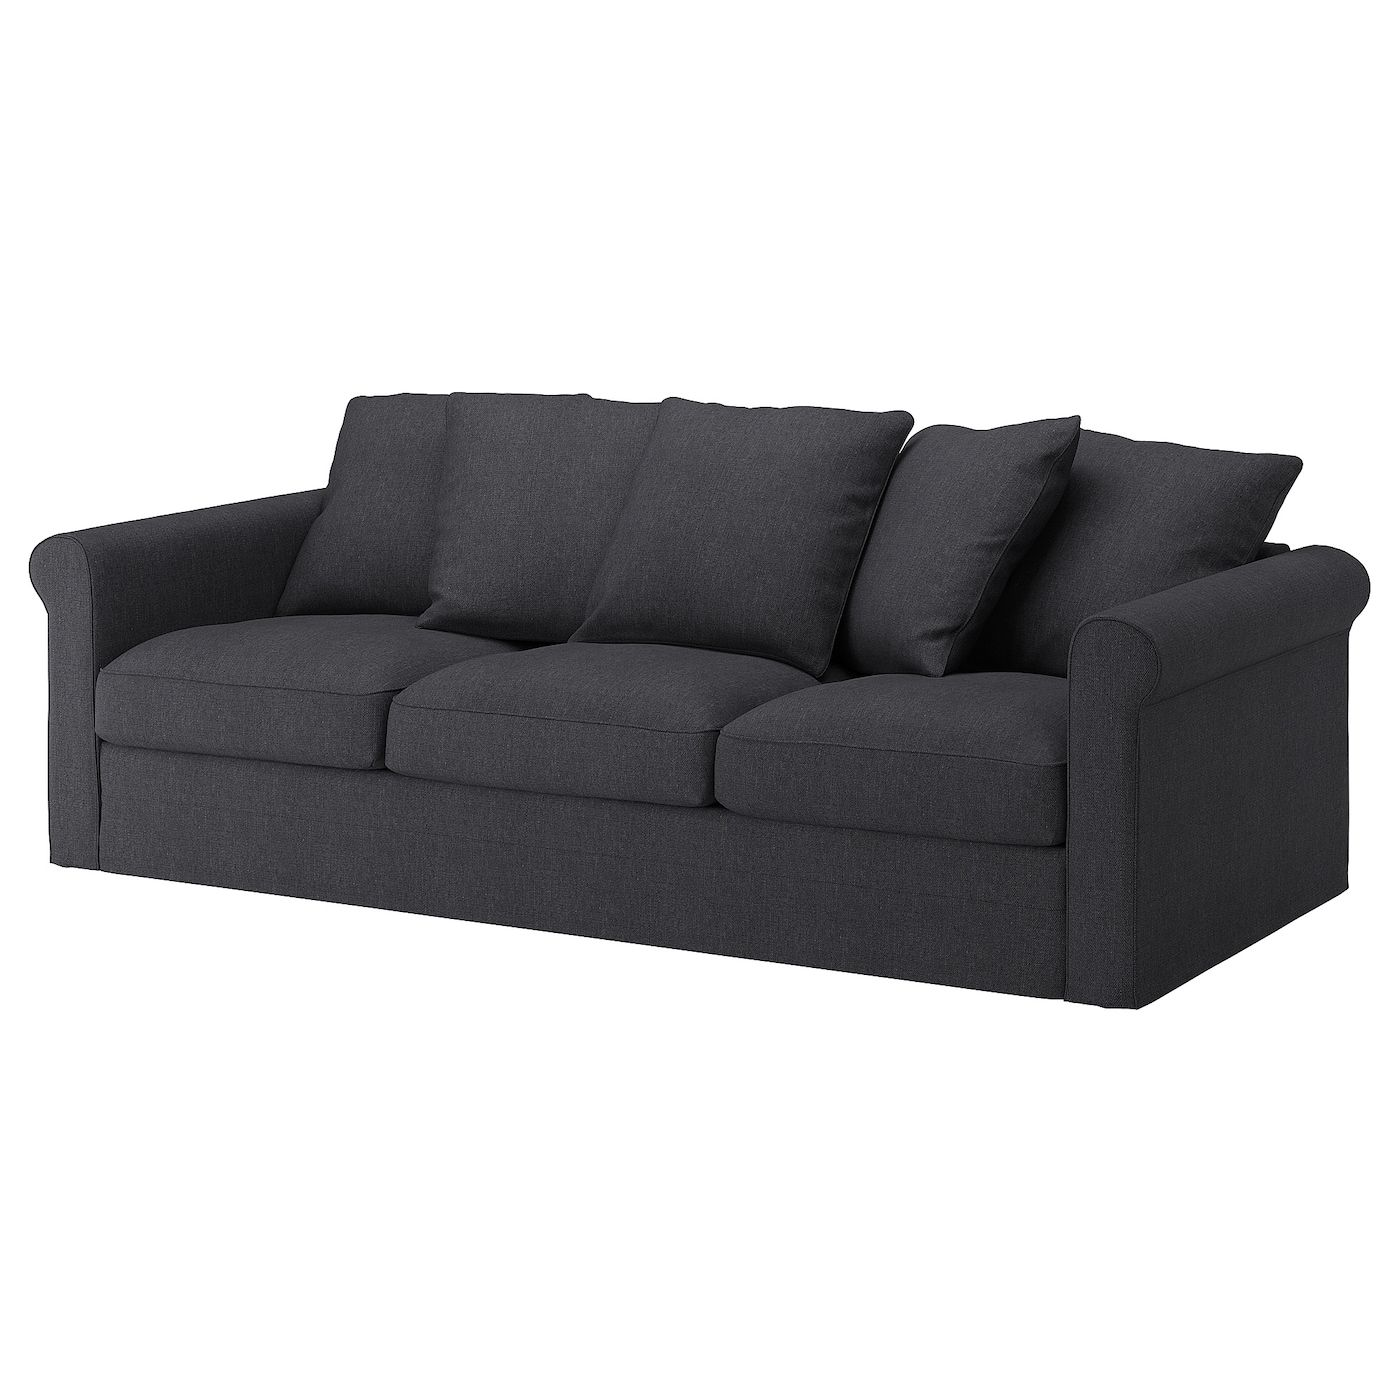 Donker Grijze Slaapbank.Ikea Gronlid Cover For Sofa Sporda Dark Gray Sofa Deep Seat